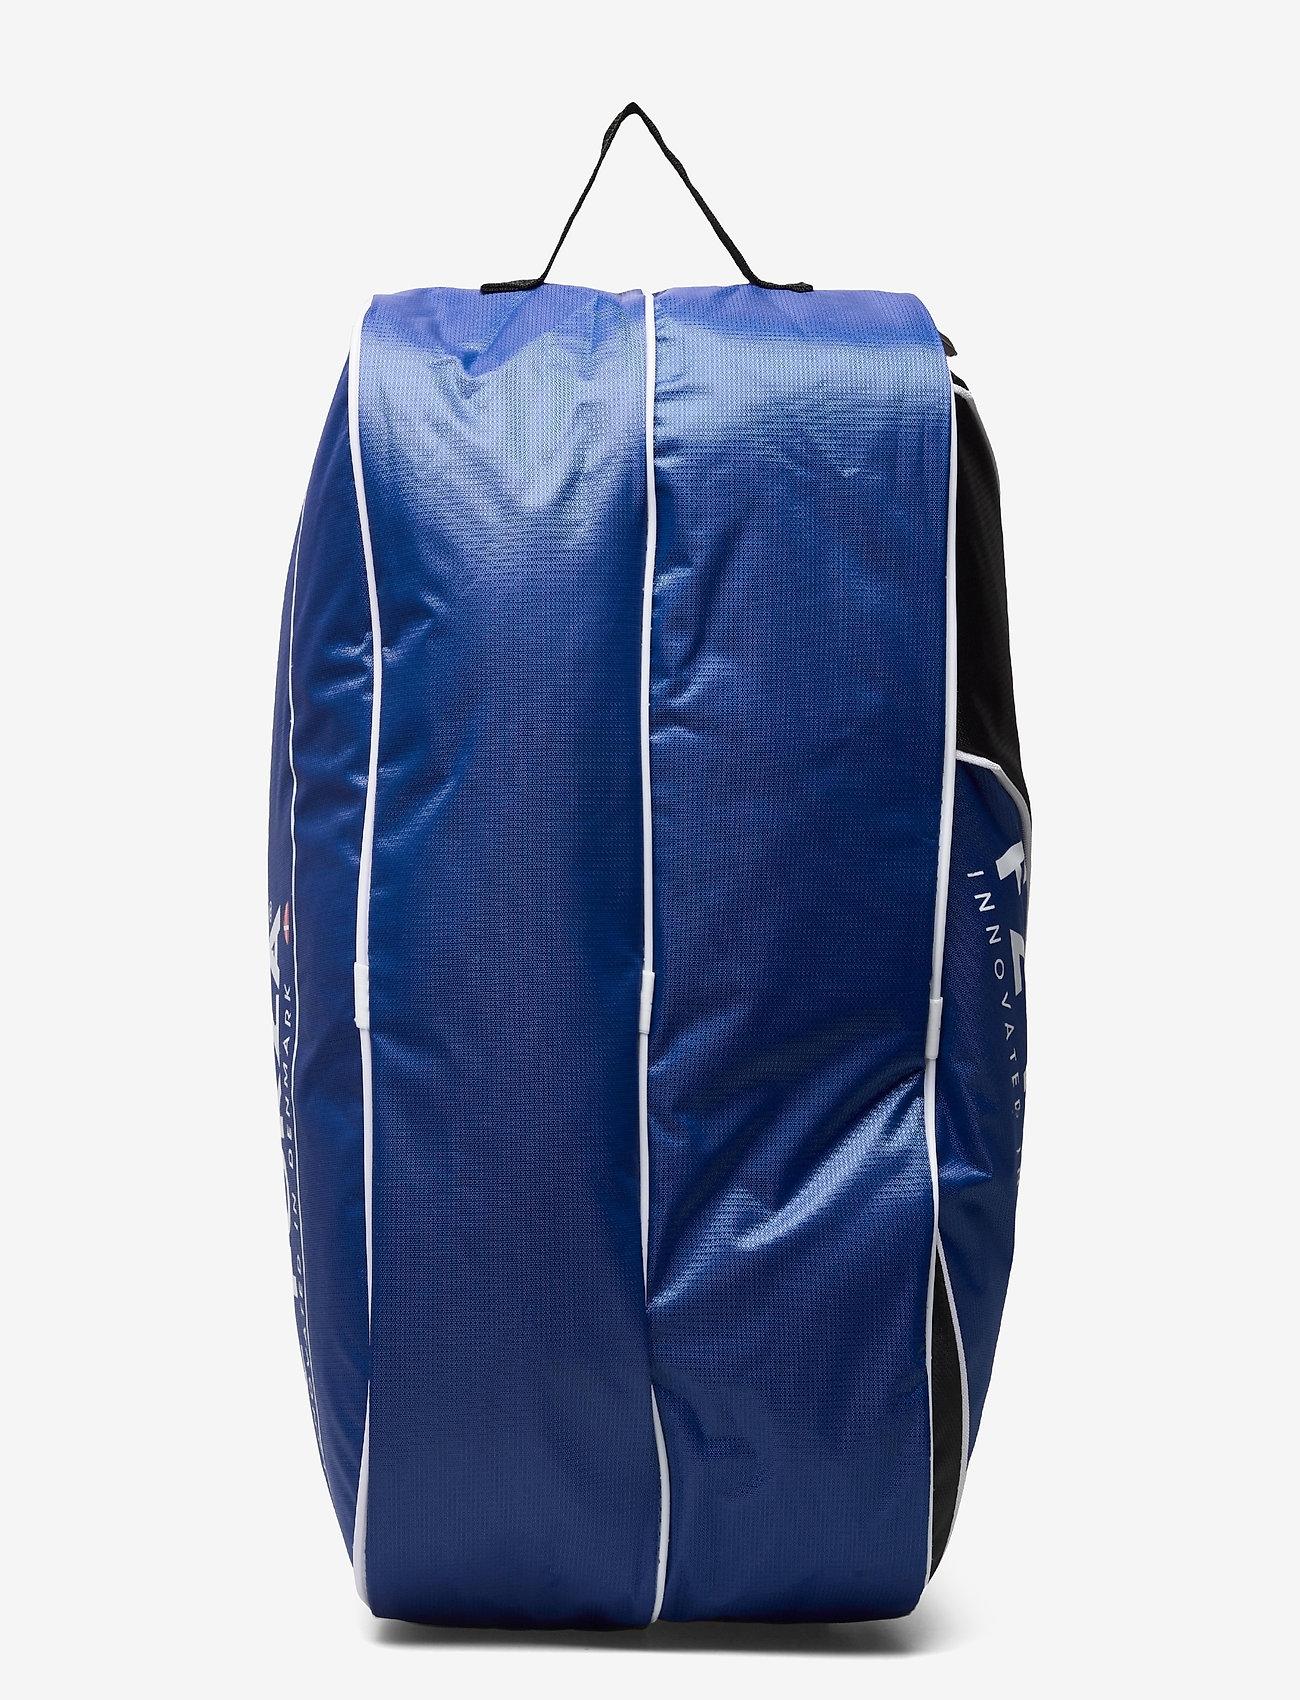 FZ Forza - FZ FORZA PADEL BAG SUPREME - ketsjersporttasker - 01109 olympian blue - 1